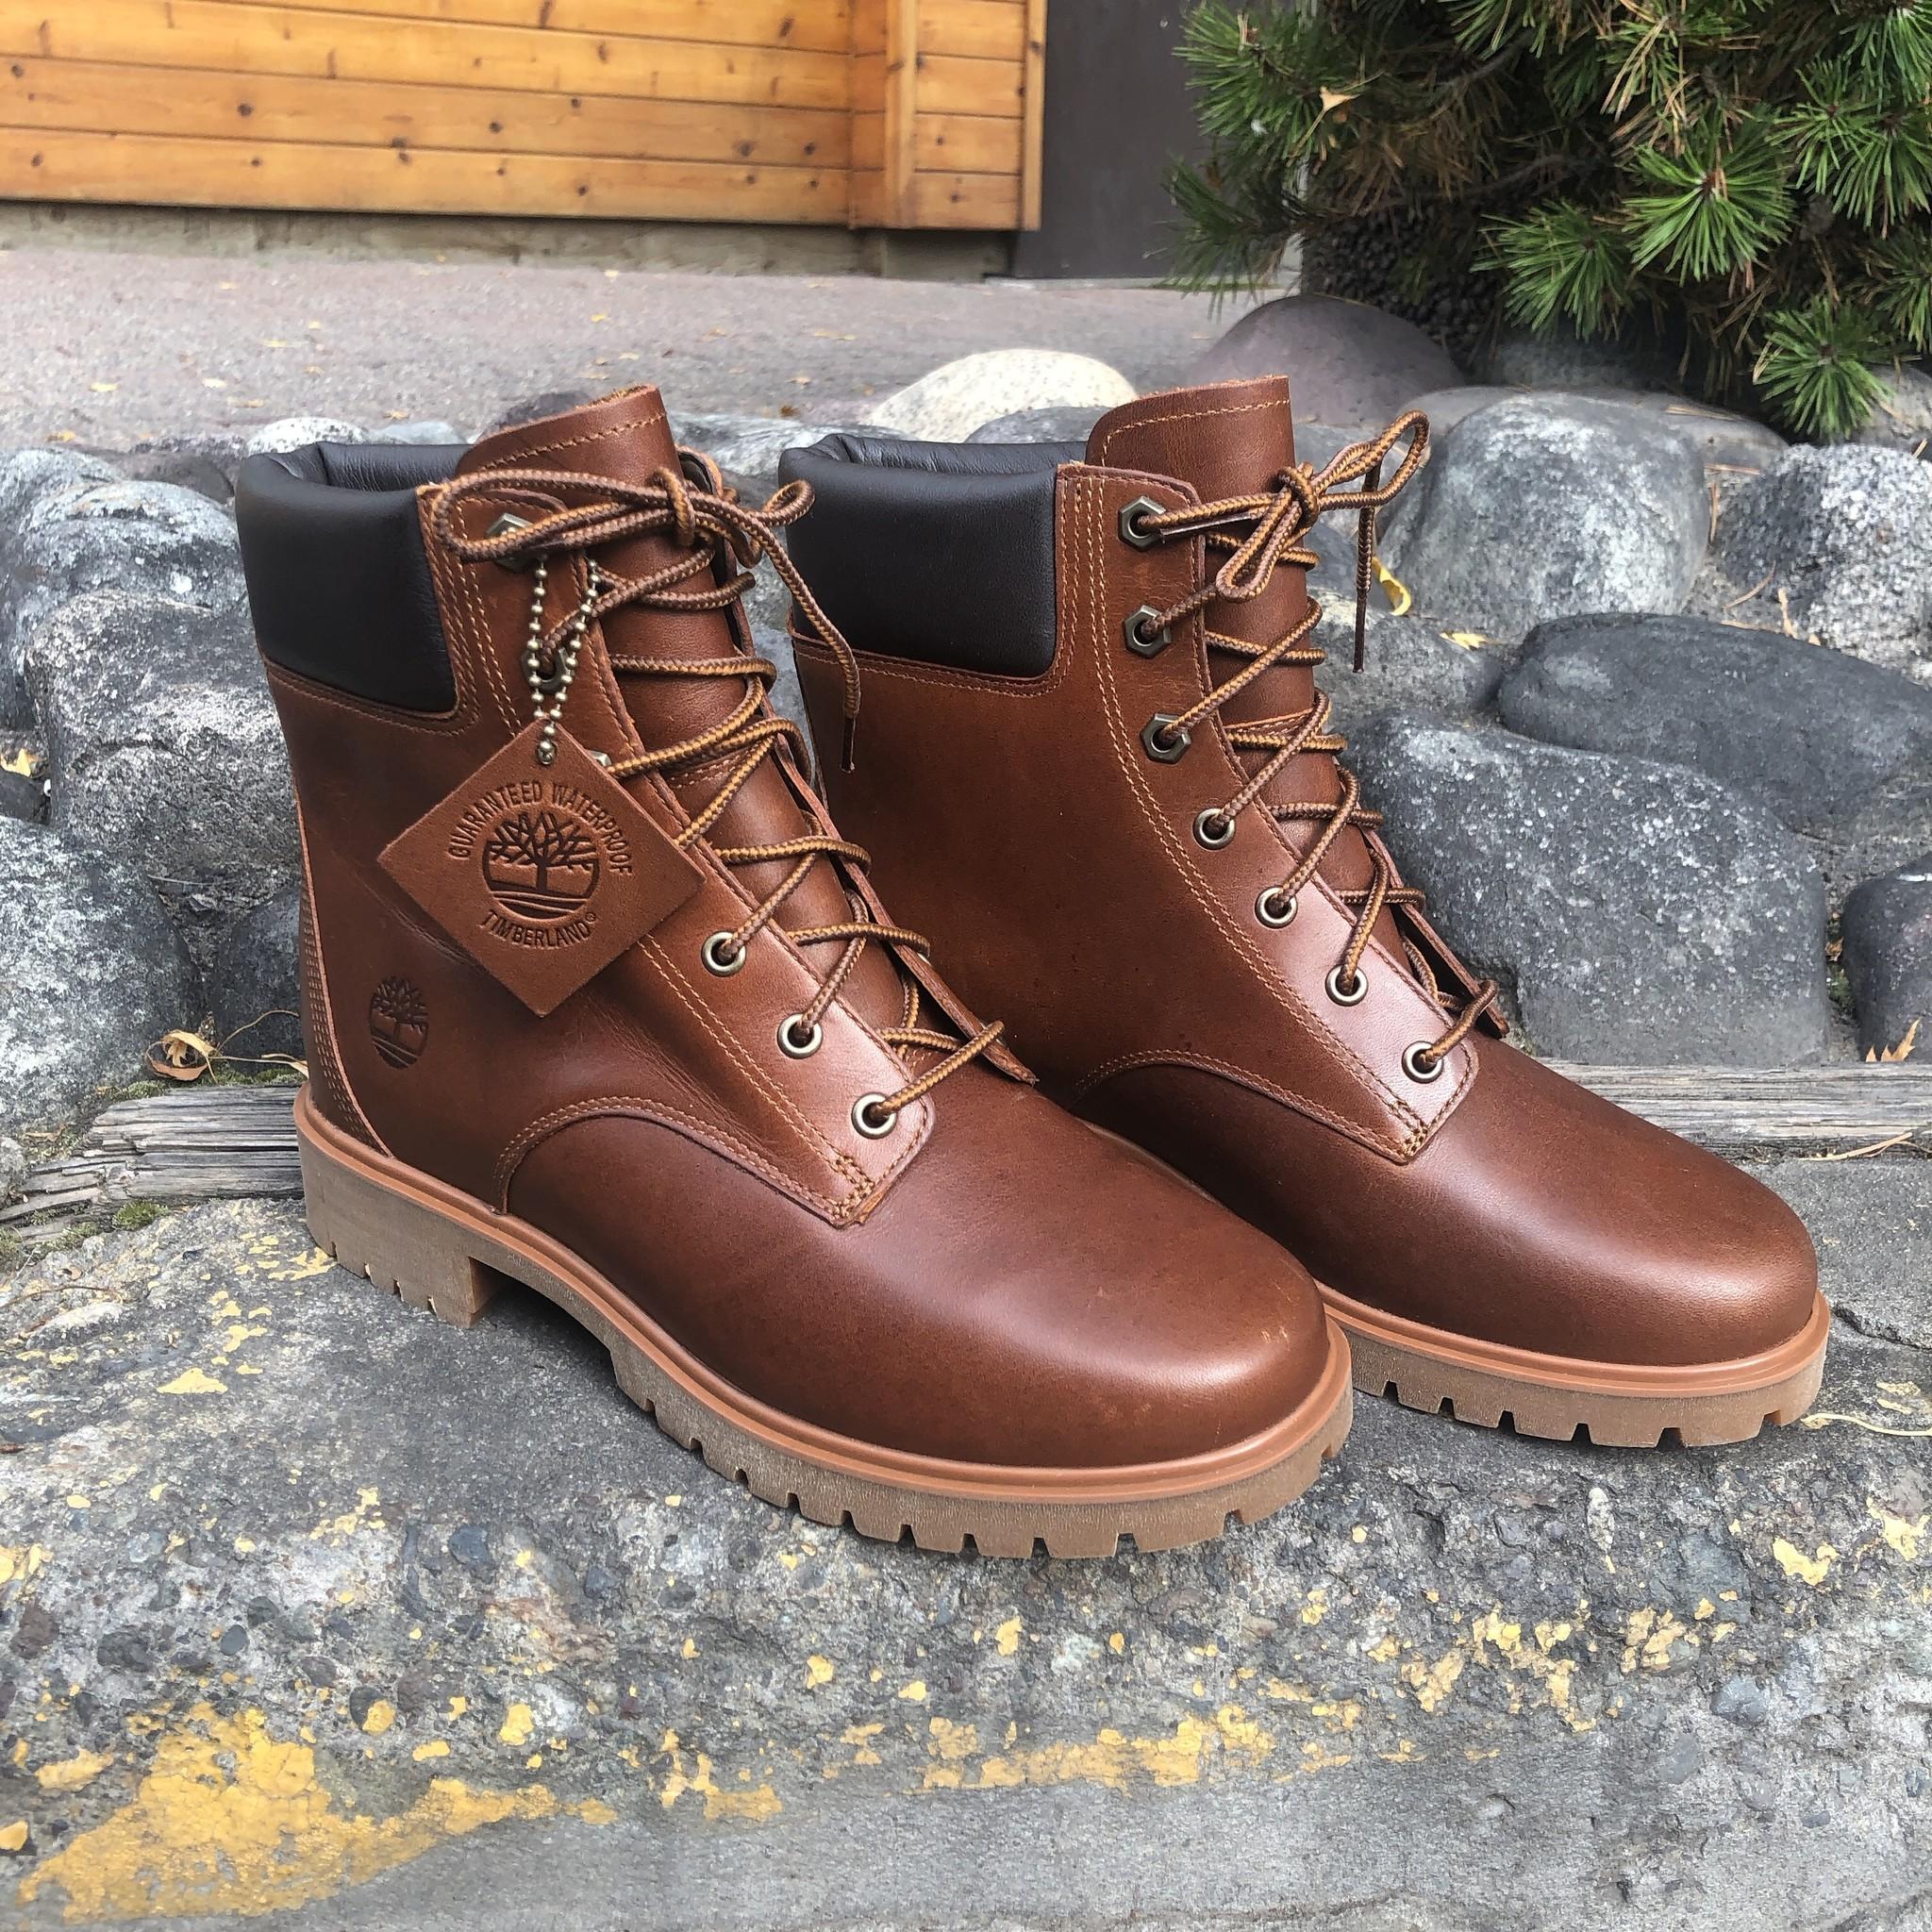 Timberland Jayne 6-inch Waterproof Boots Brown